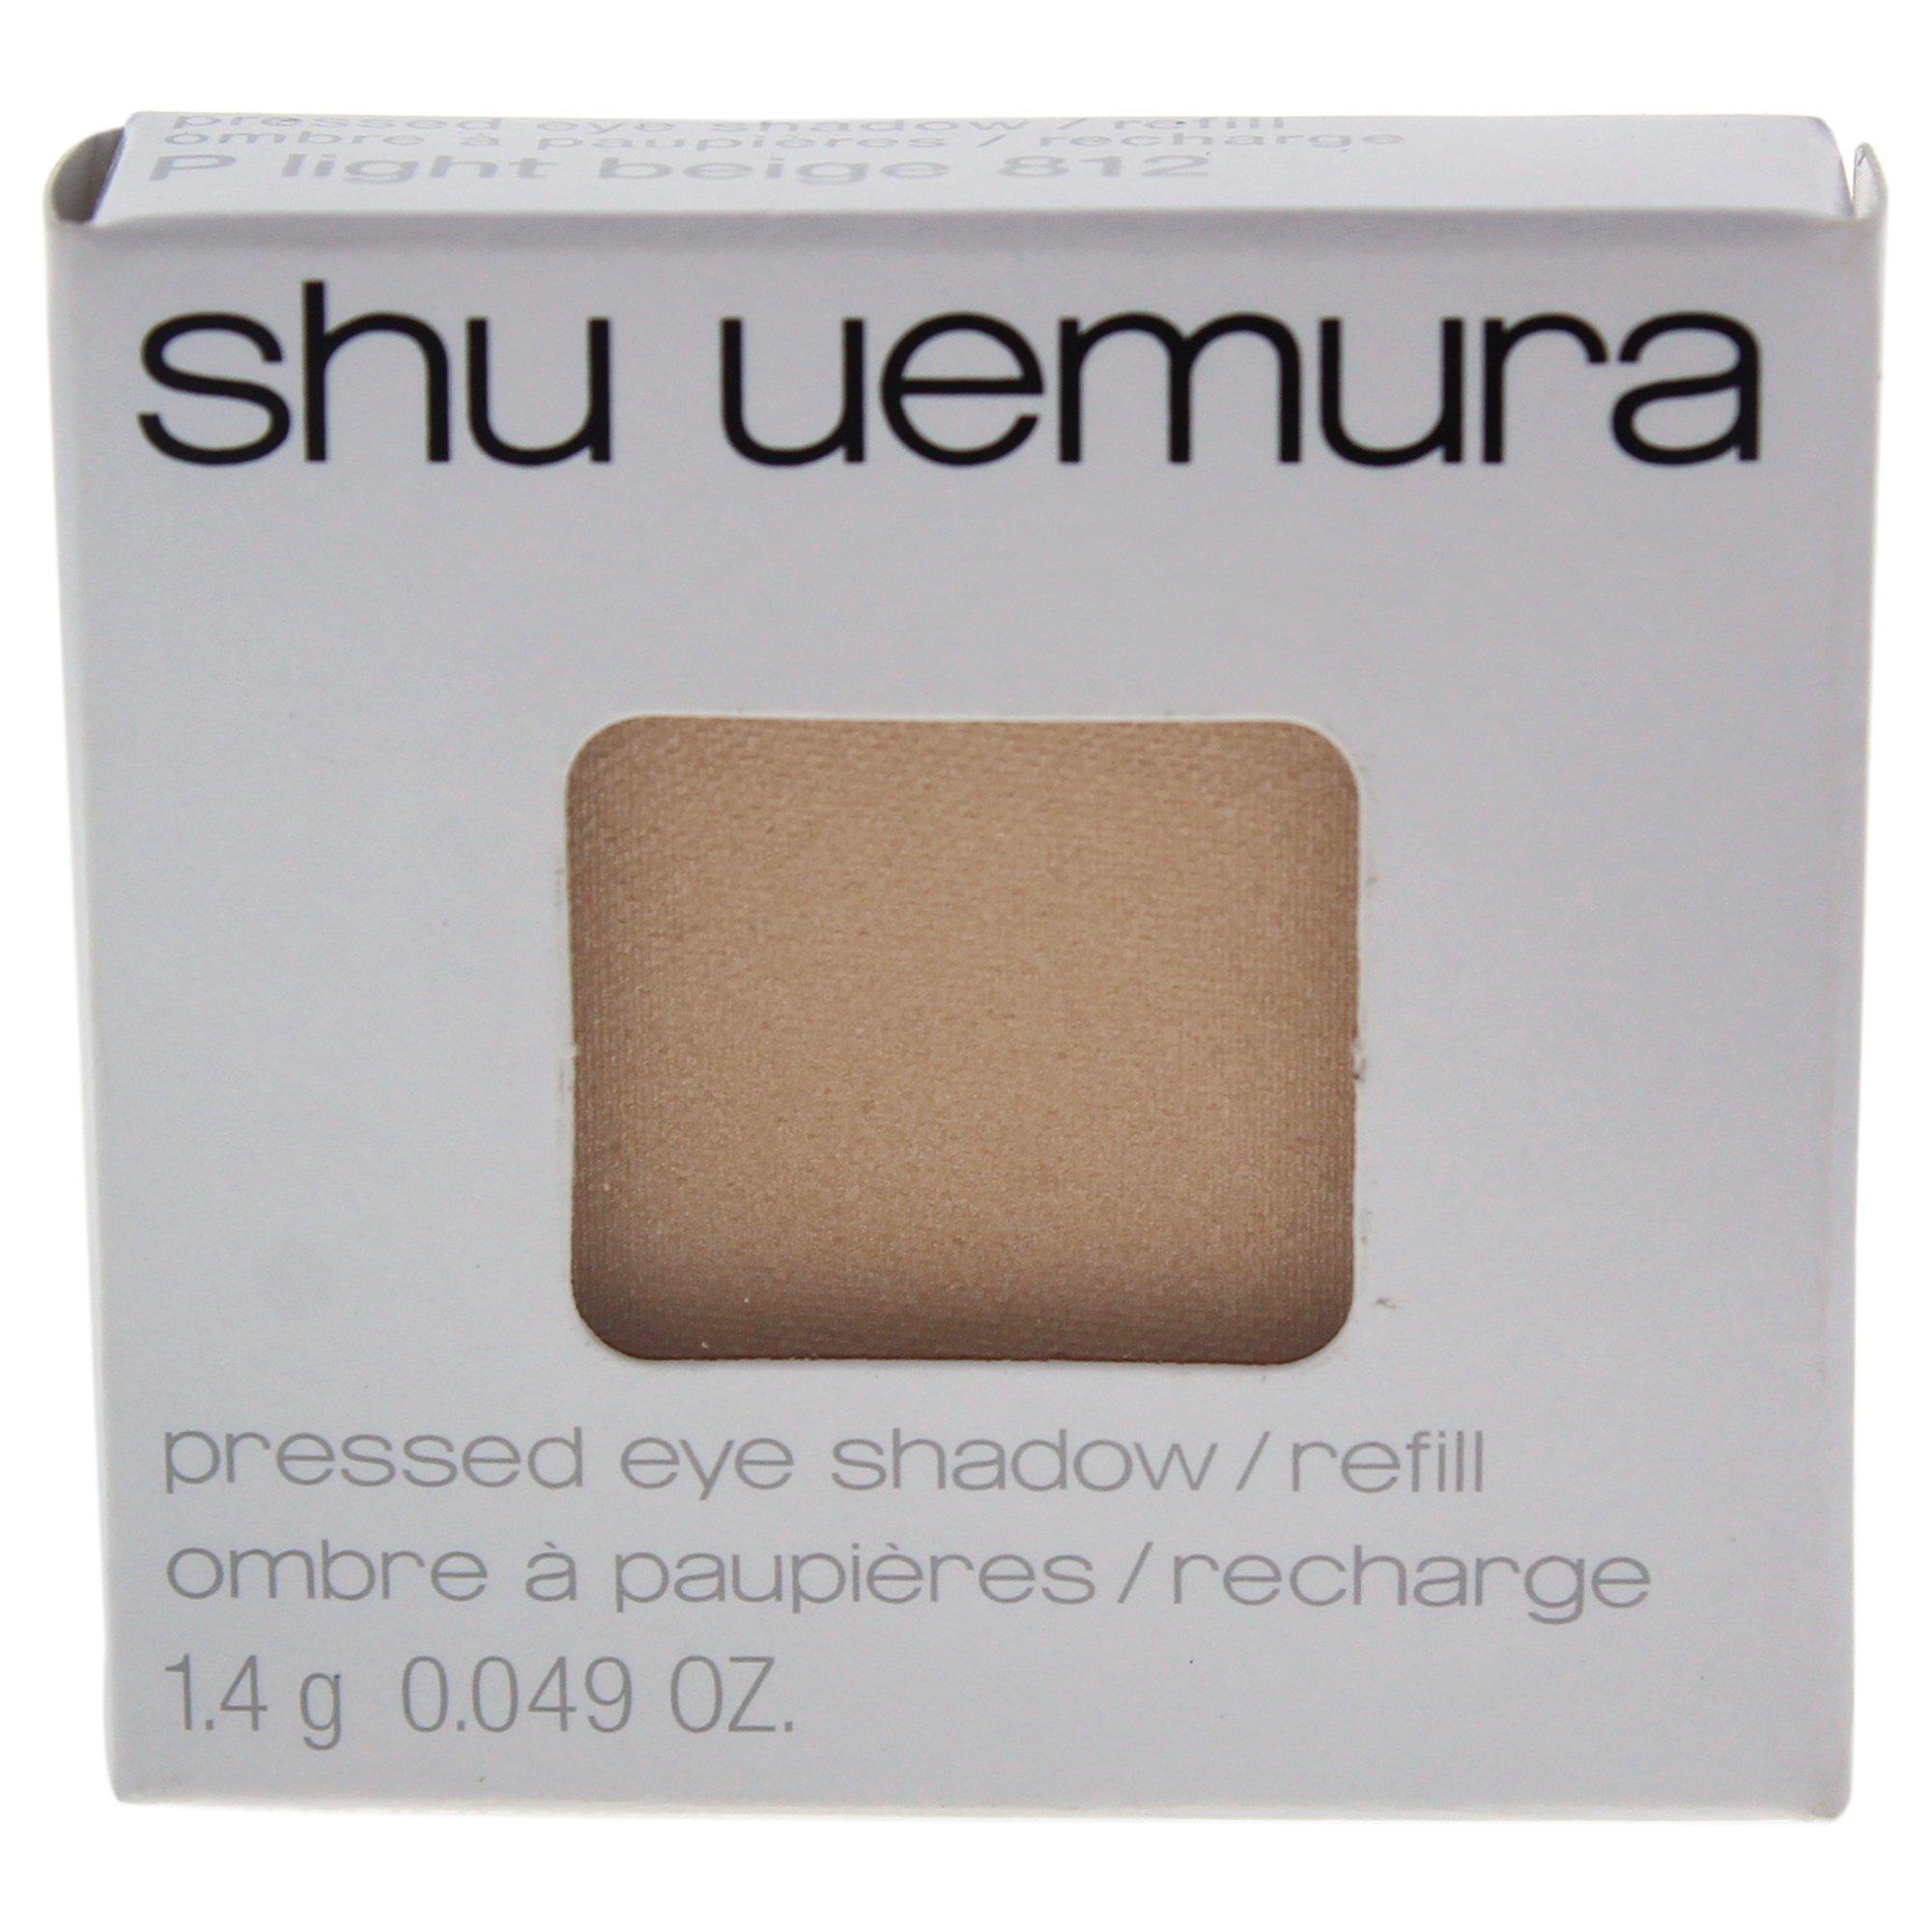 Shu Uemura Pressed Eye Shadow, 812 P Light Beige (refill), 0.049 Ounce